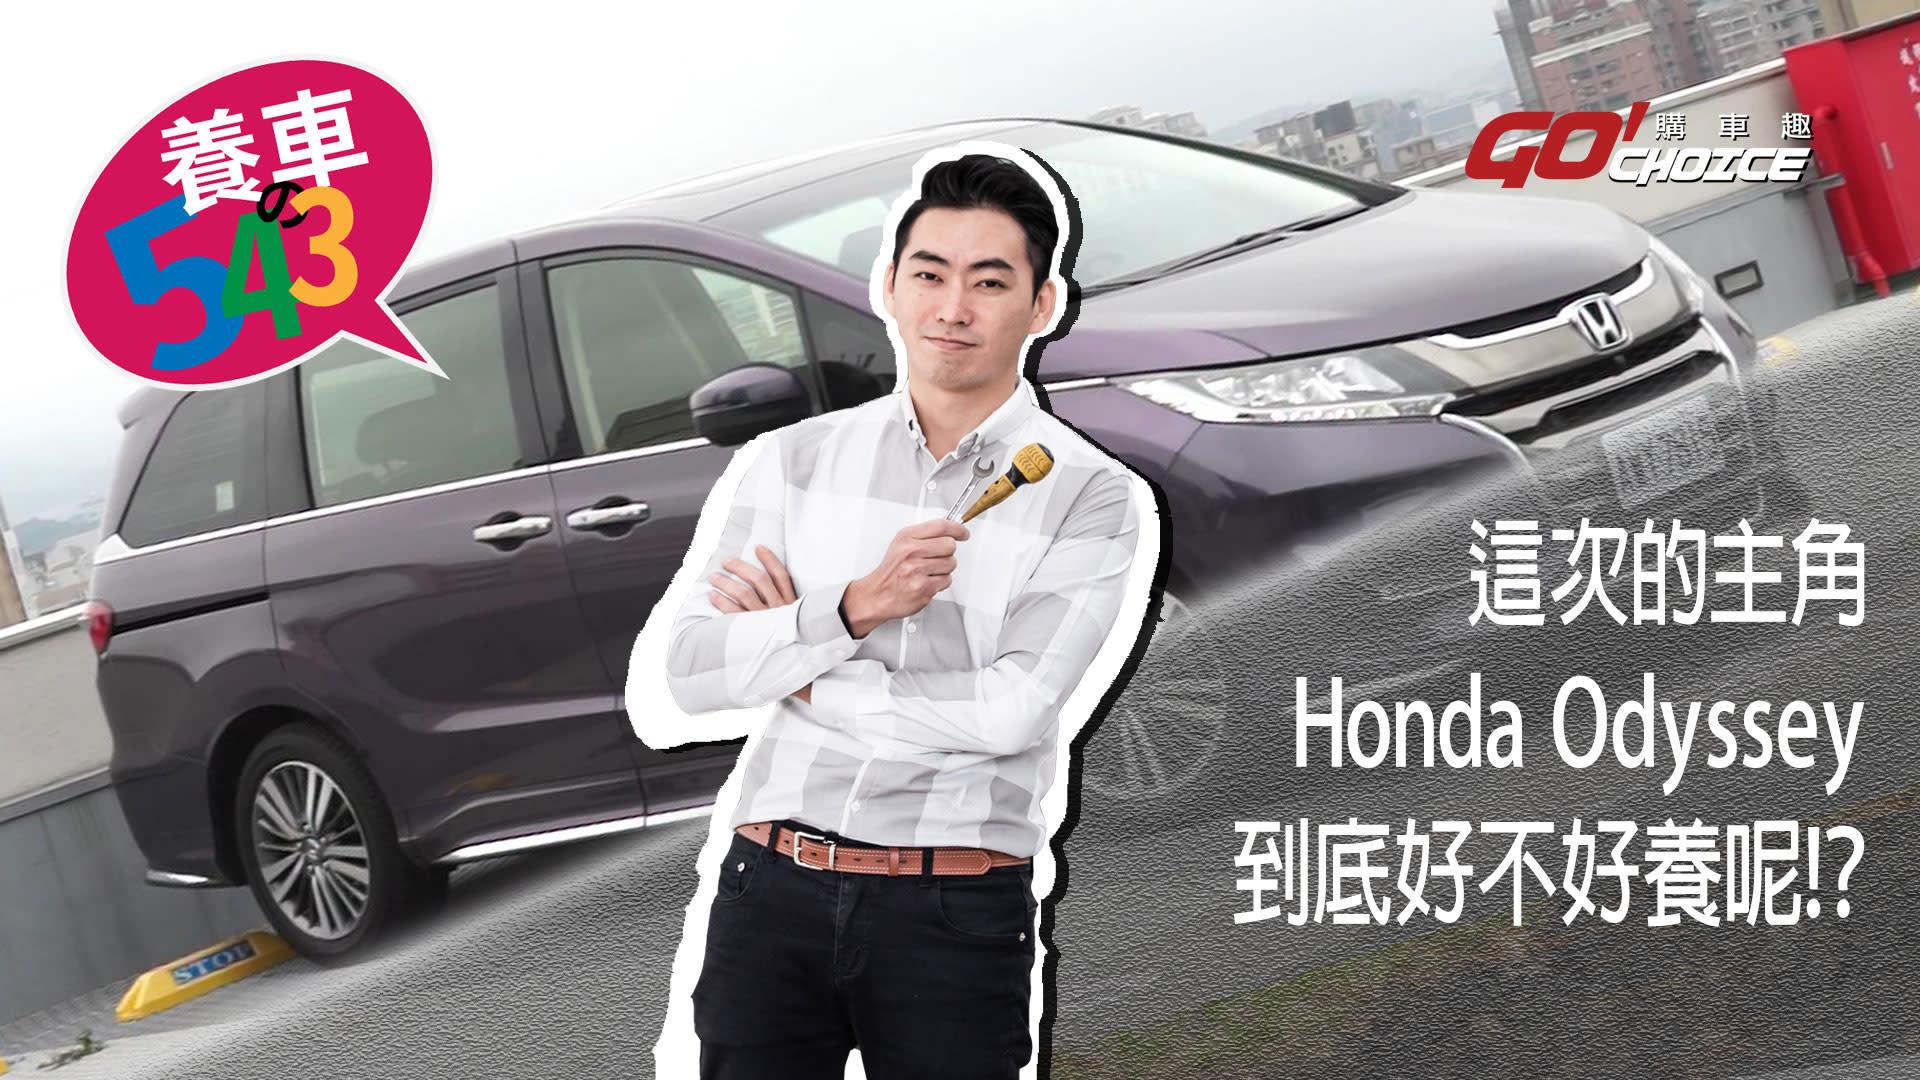 養車543-Honda Odyssey (第三集)